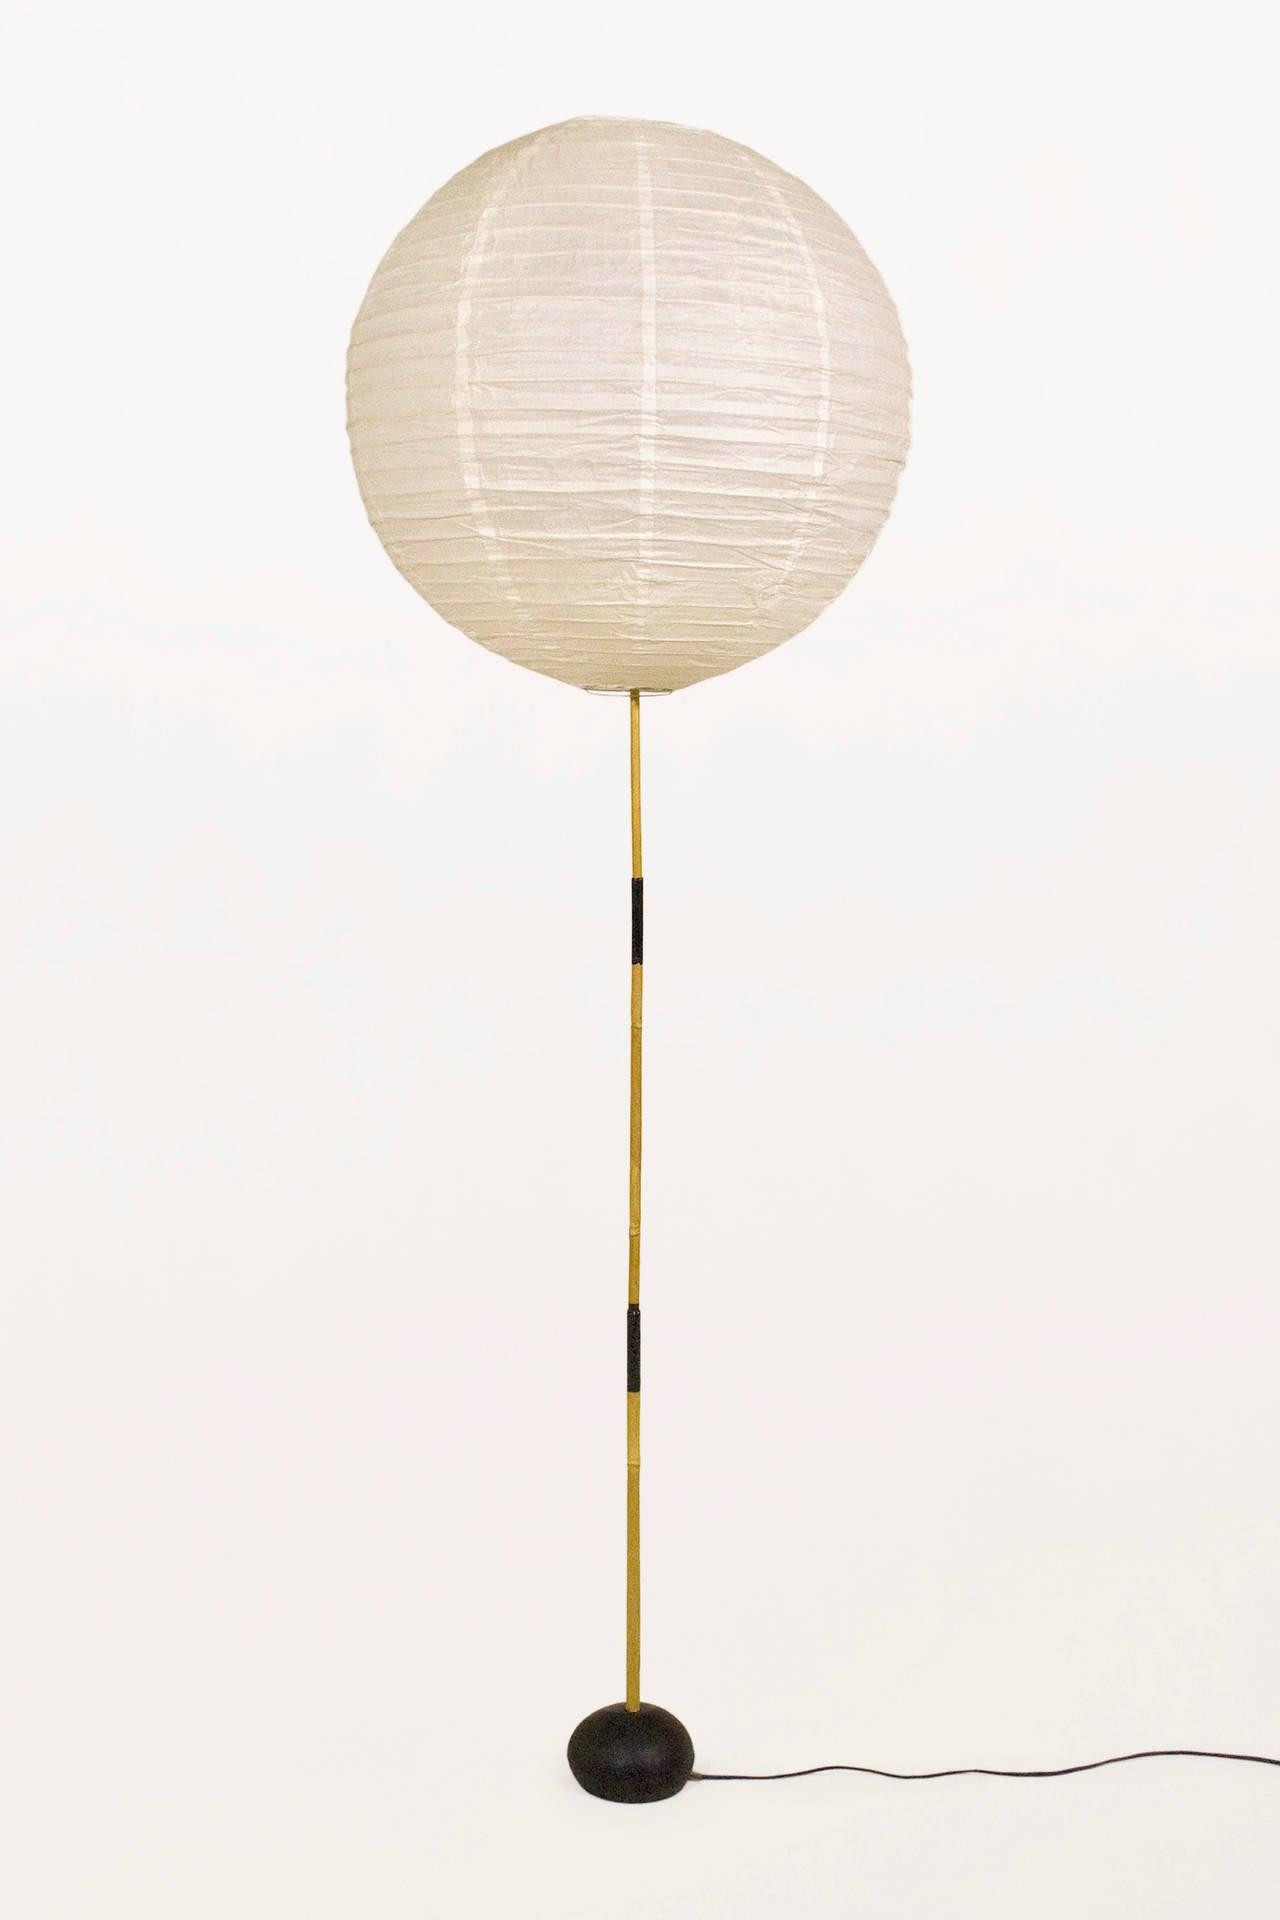 Uncategorized Akari Floor Lamp early isamu noguchi akari floor lamp circa 1950 japan at 1stdibs 2